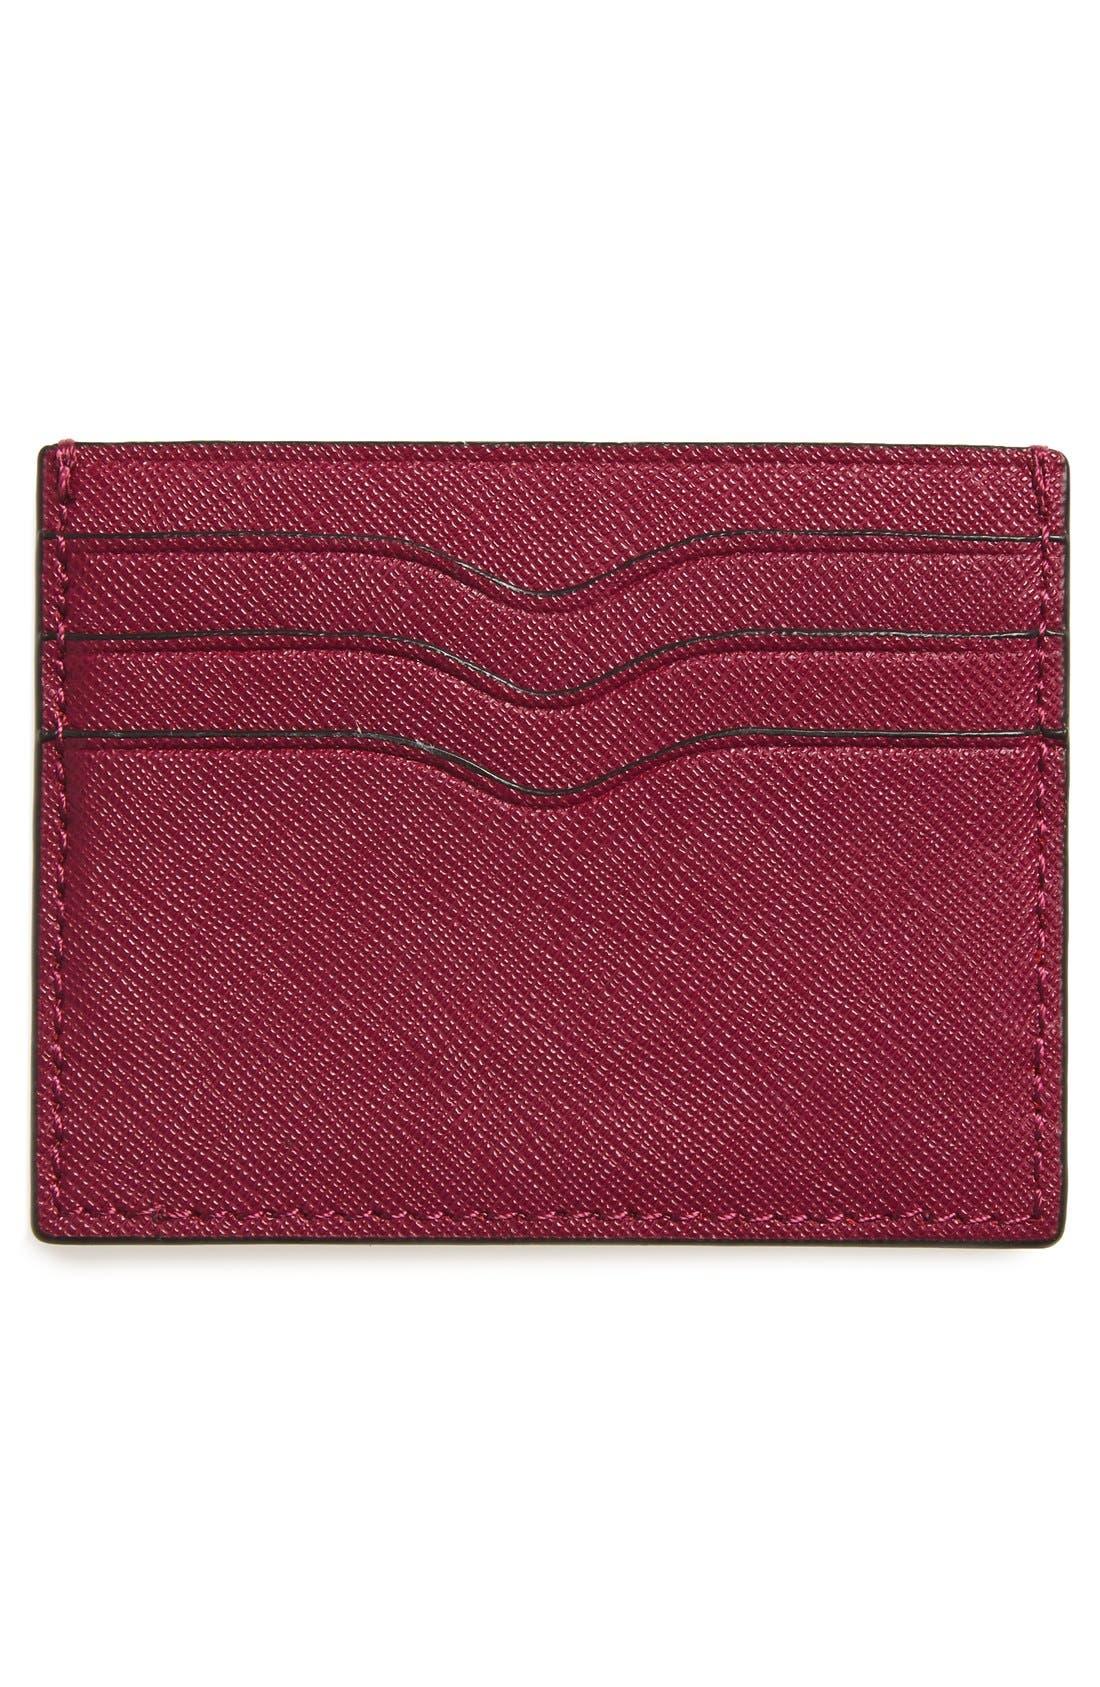 Alternate Image 2  - Rebecca Minkoff Everyday Leather Card Case